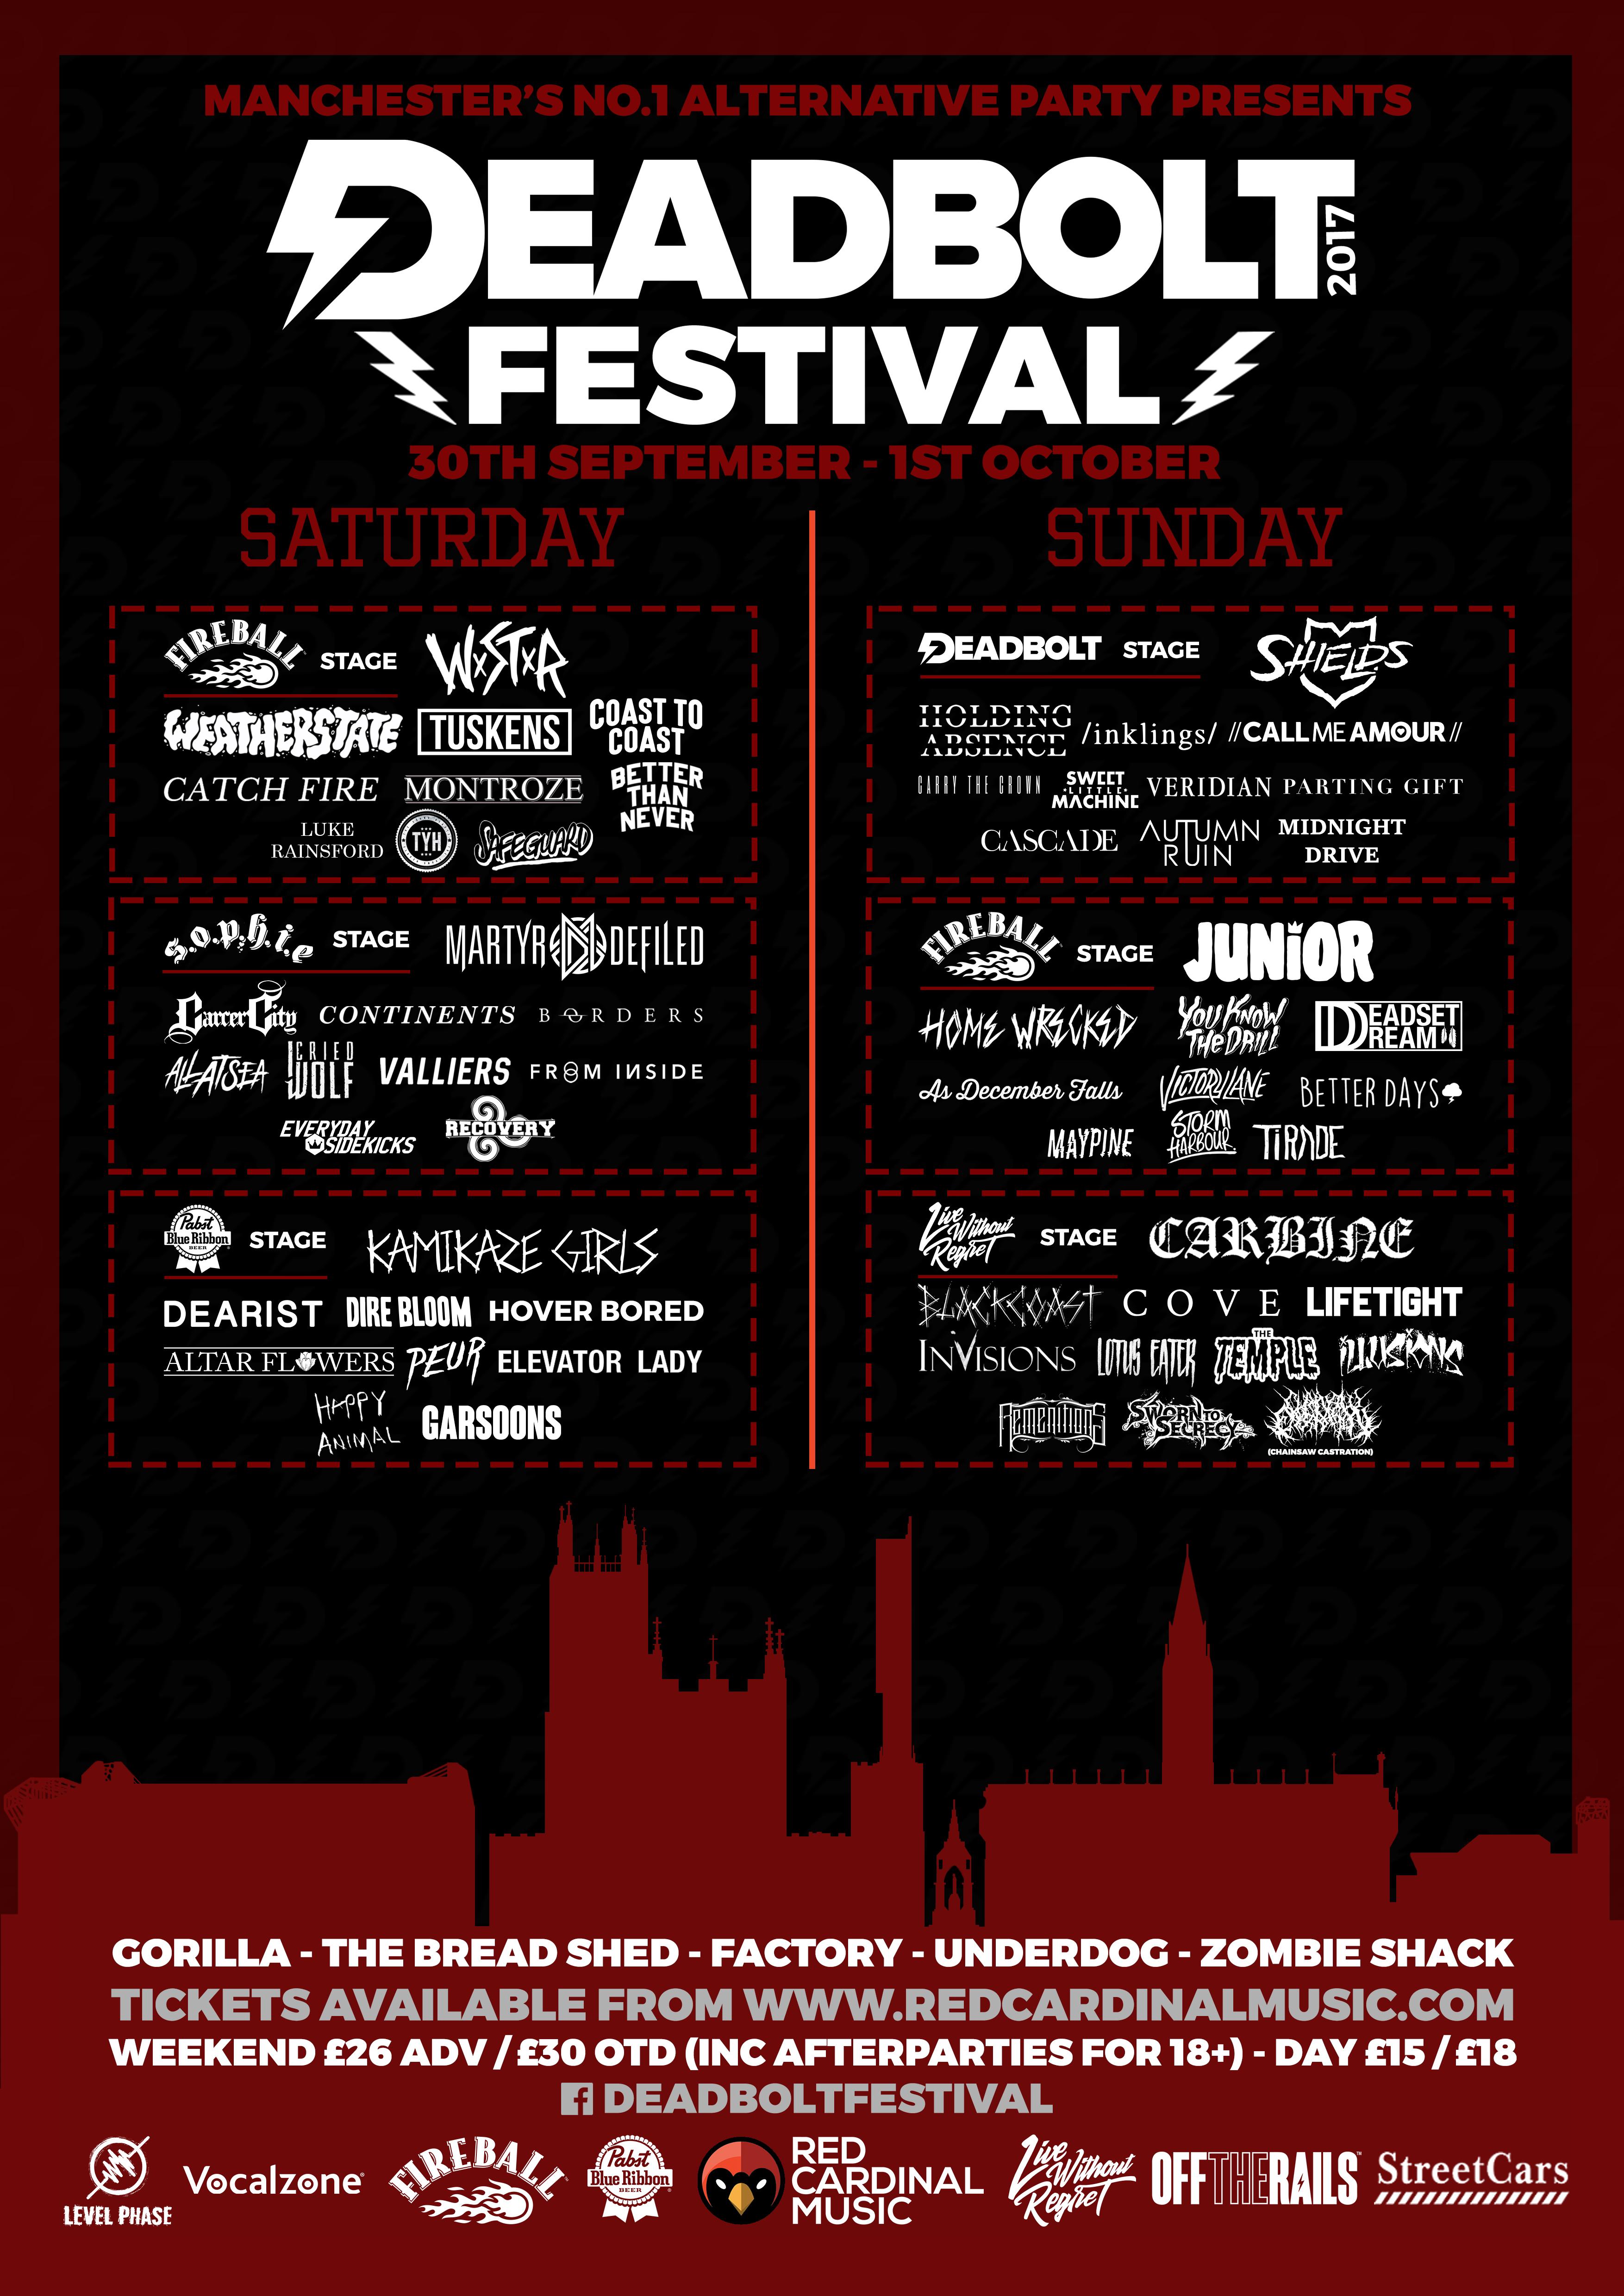 Deadbolt Festival 2017 Poster Stage Splits - Manchester - Red Cardinal Music